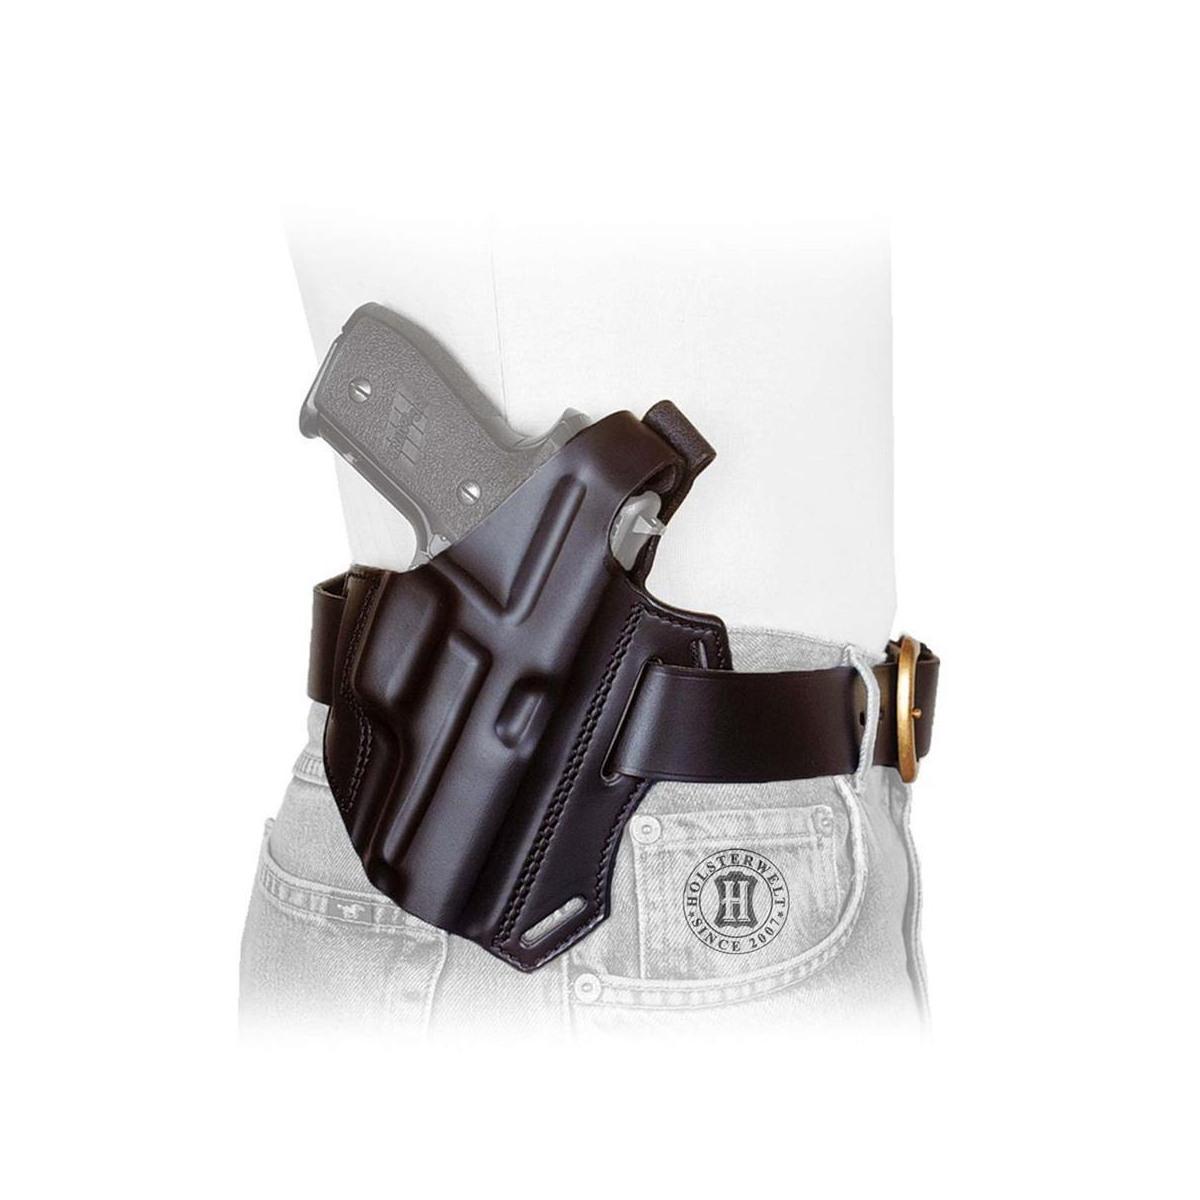 Holster MULTI VARIO right-Handed-brown-S&W L-Frame, Colt Pyth., Tauru